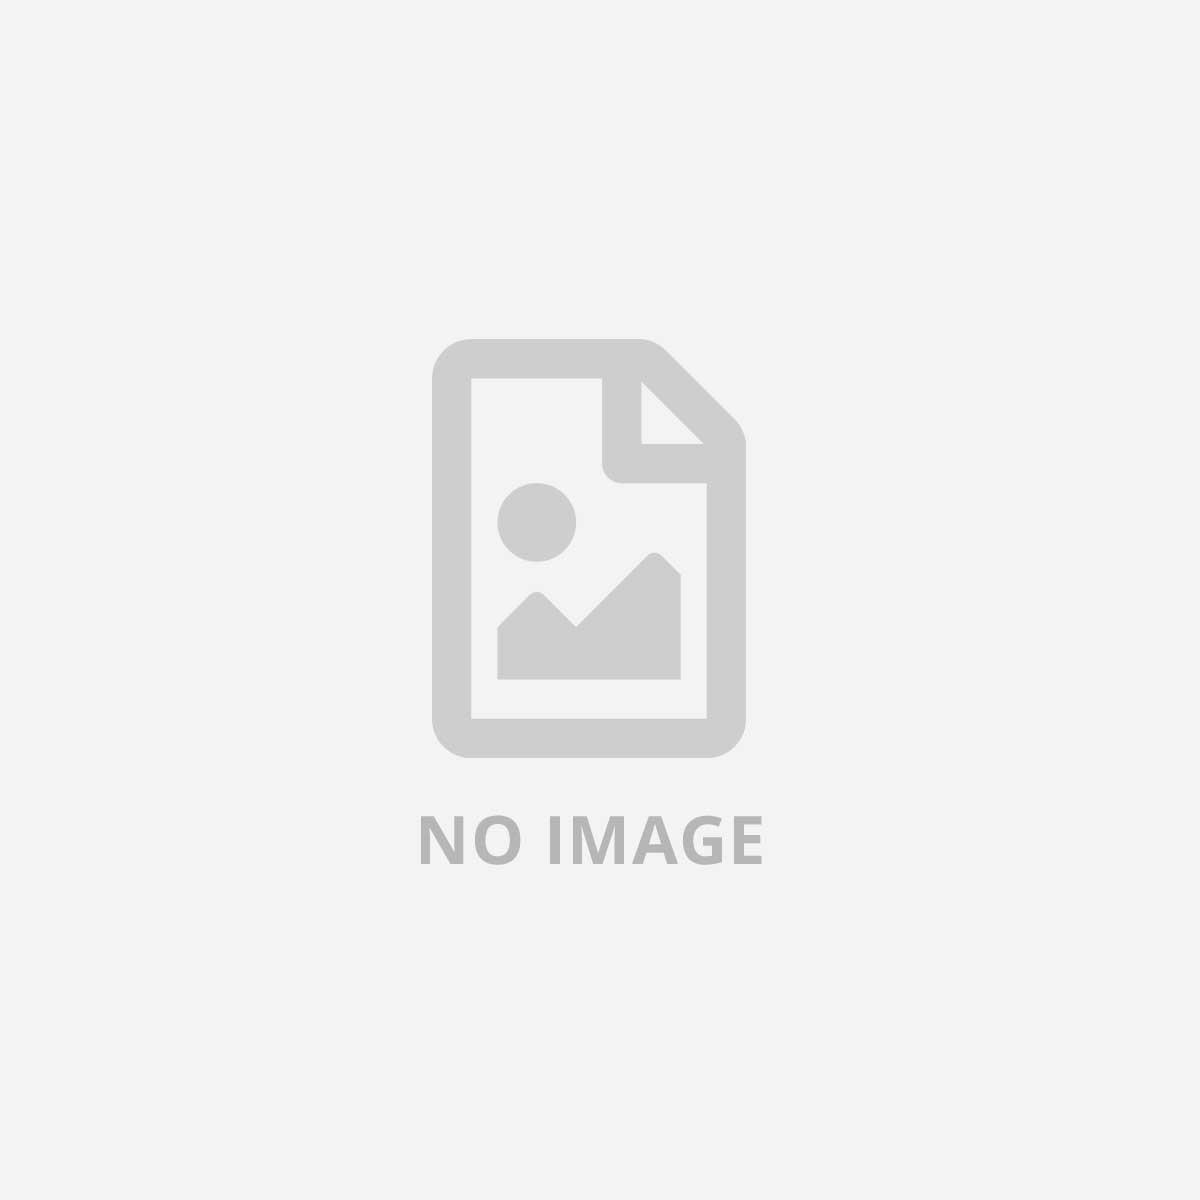 CONCEPTRONIC 4-PORT SATA PCIE ADAPTER+SATA CABLE